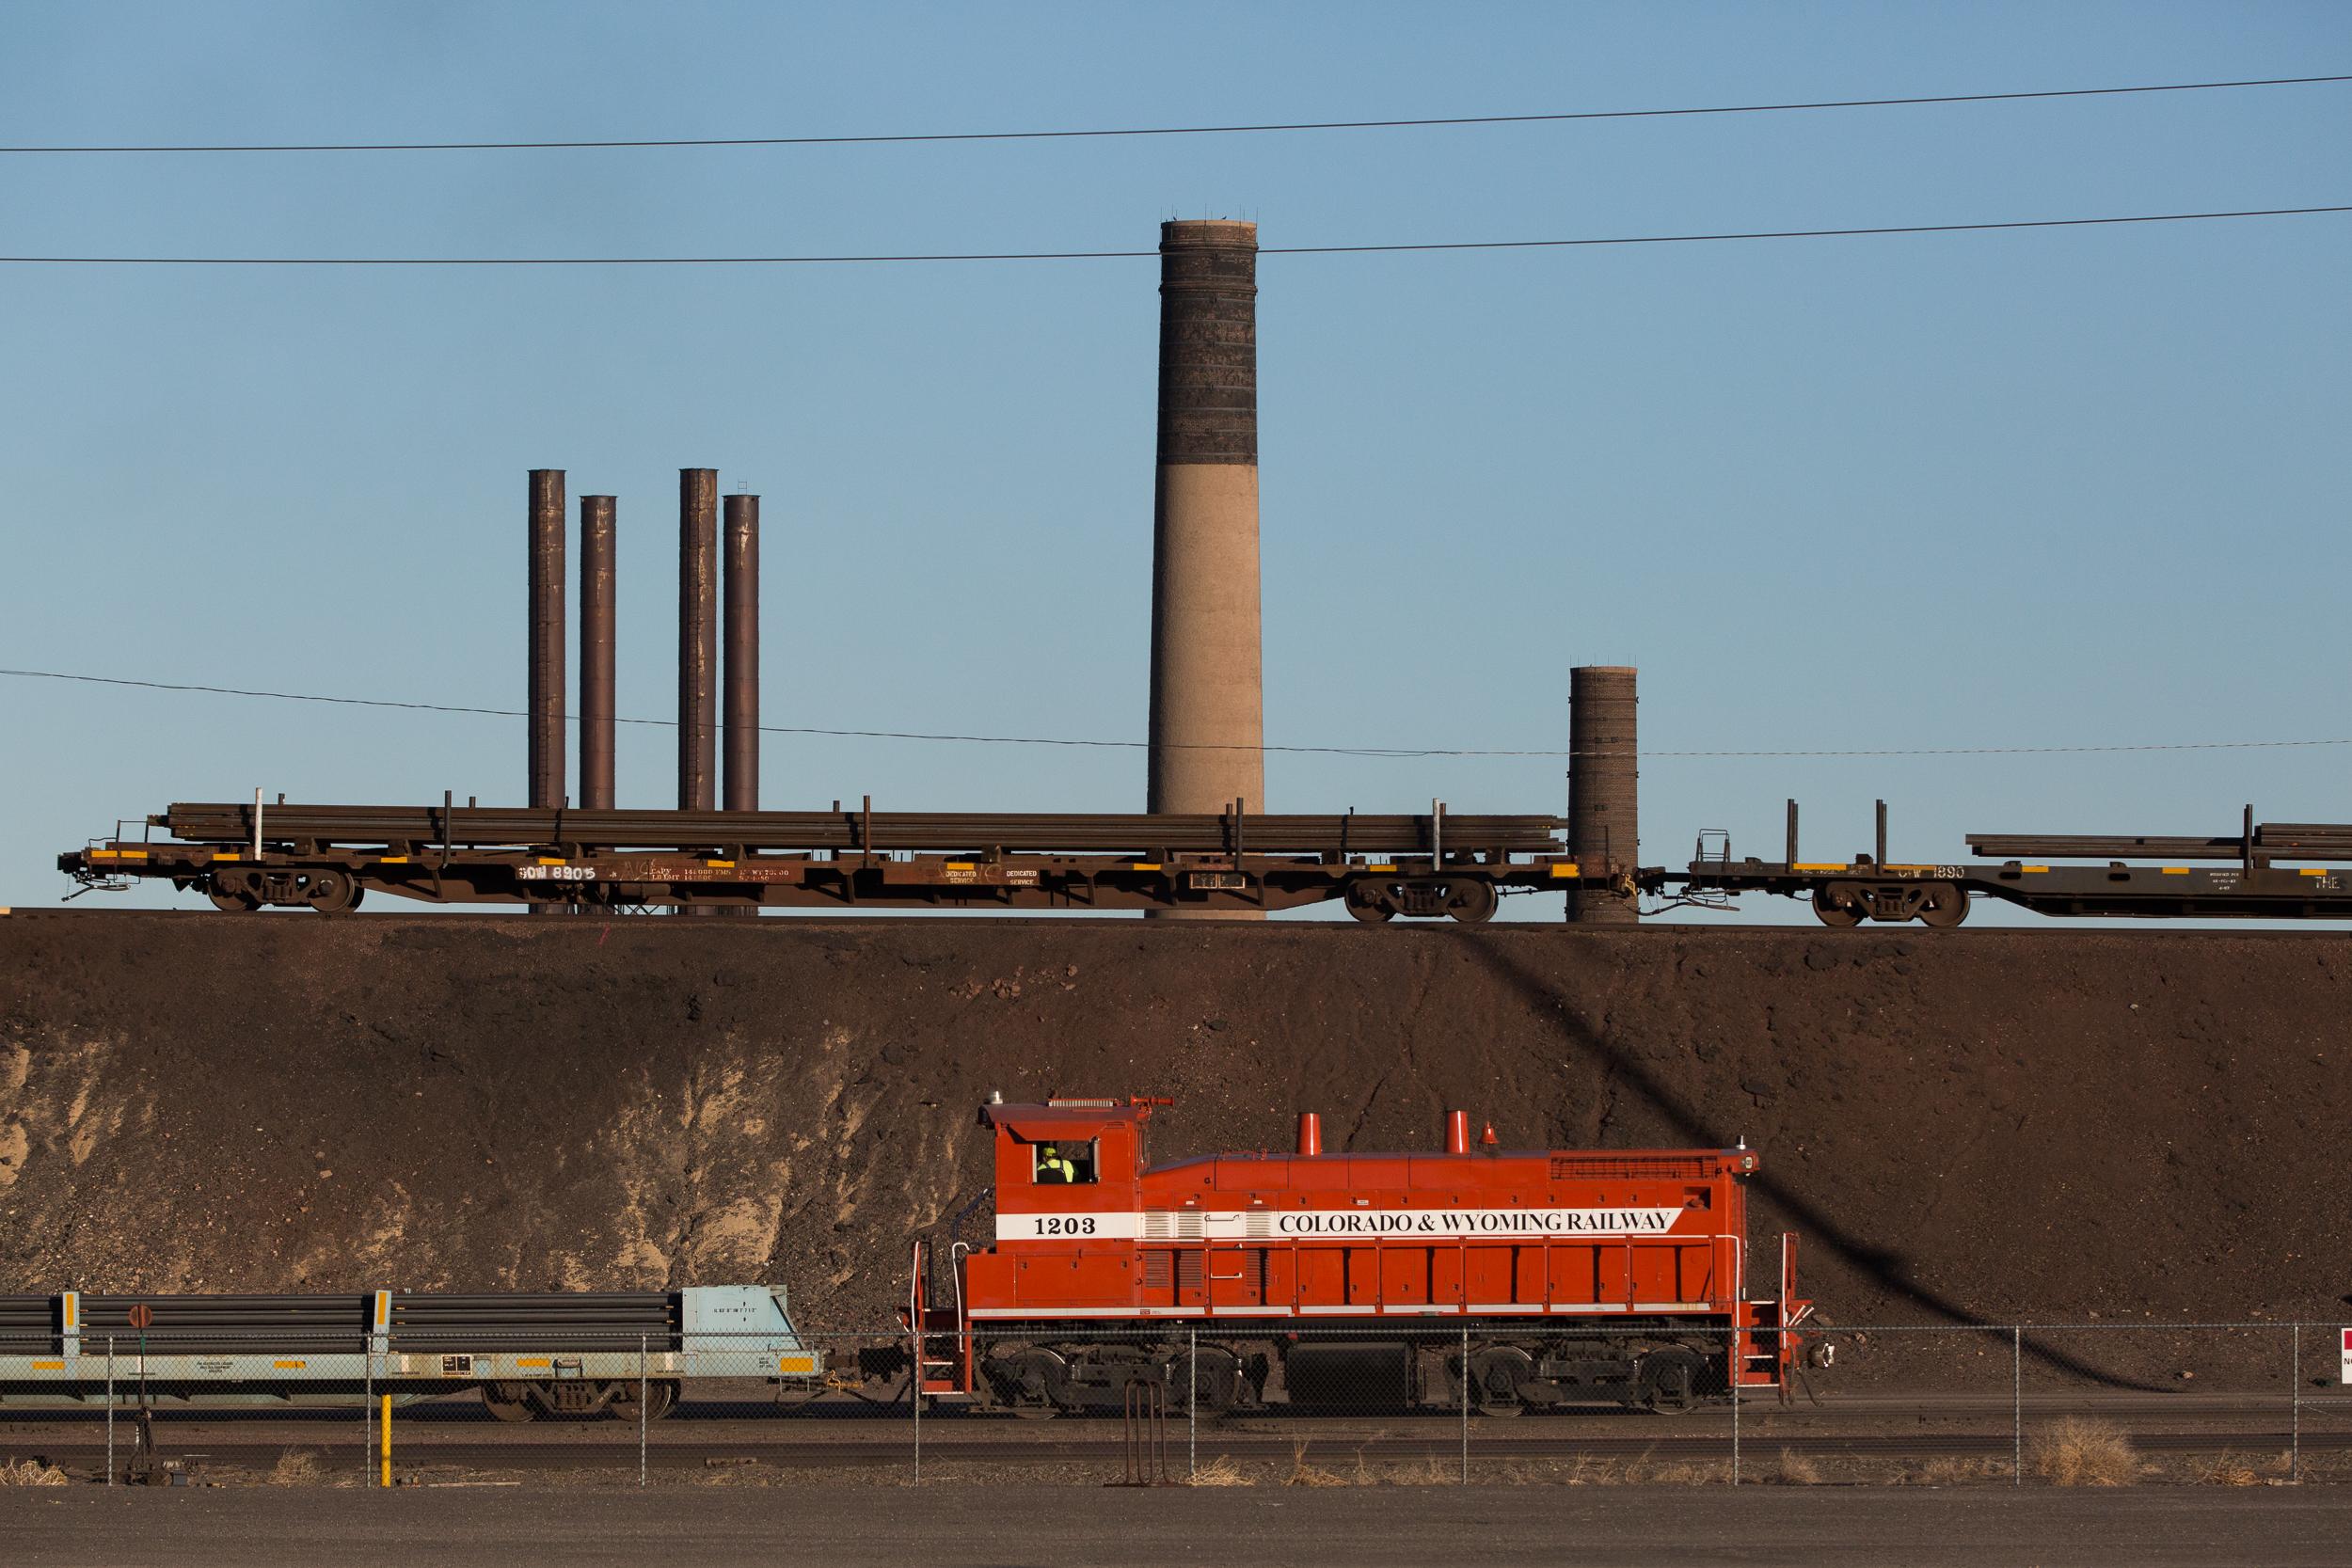 Pueblo Steel On Trains